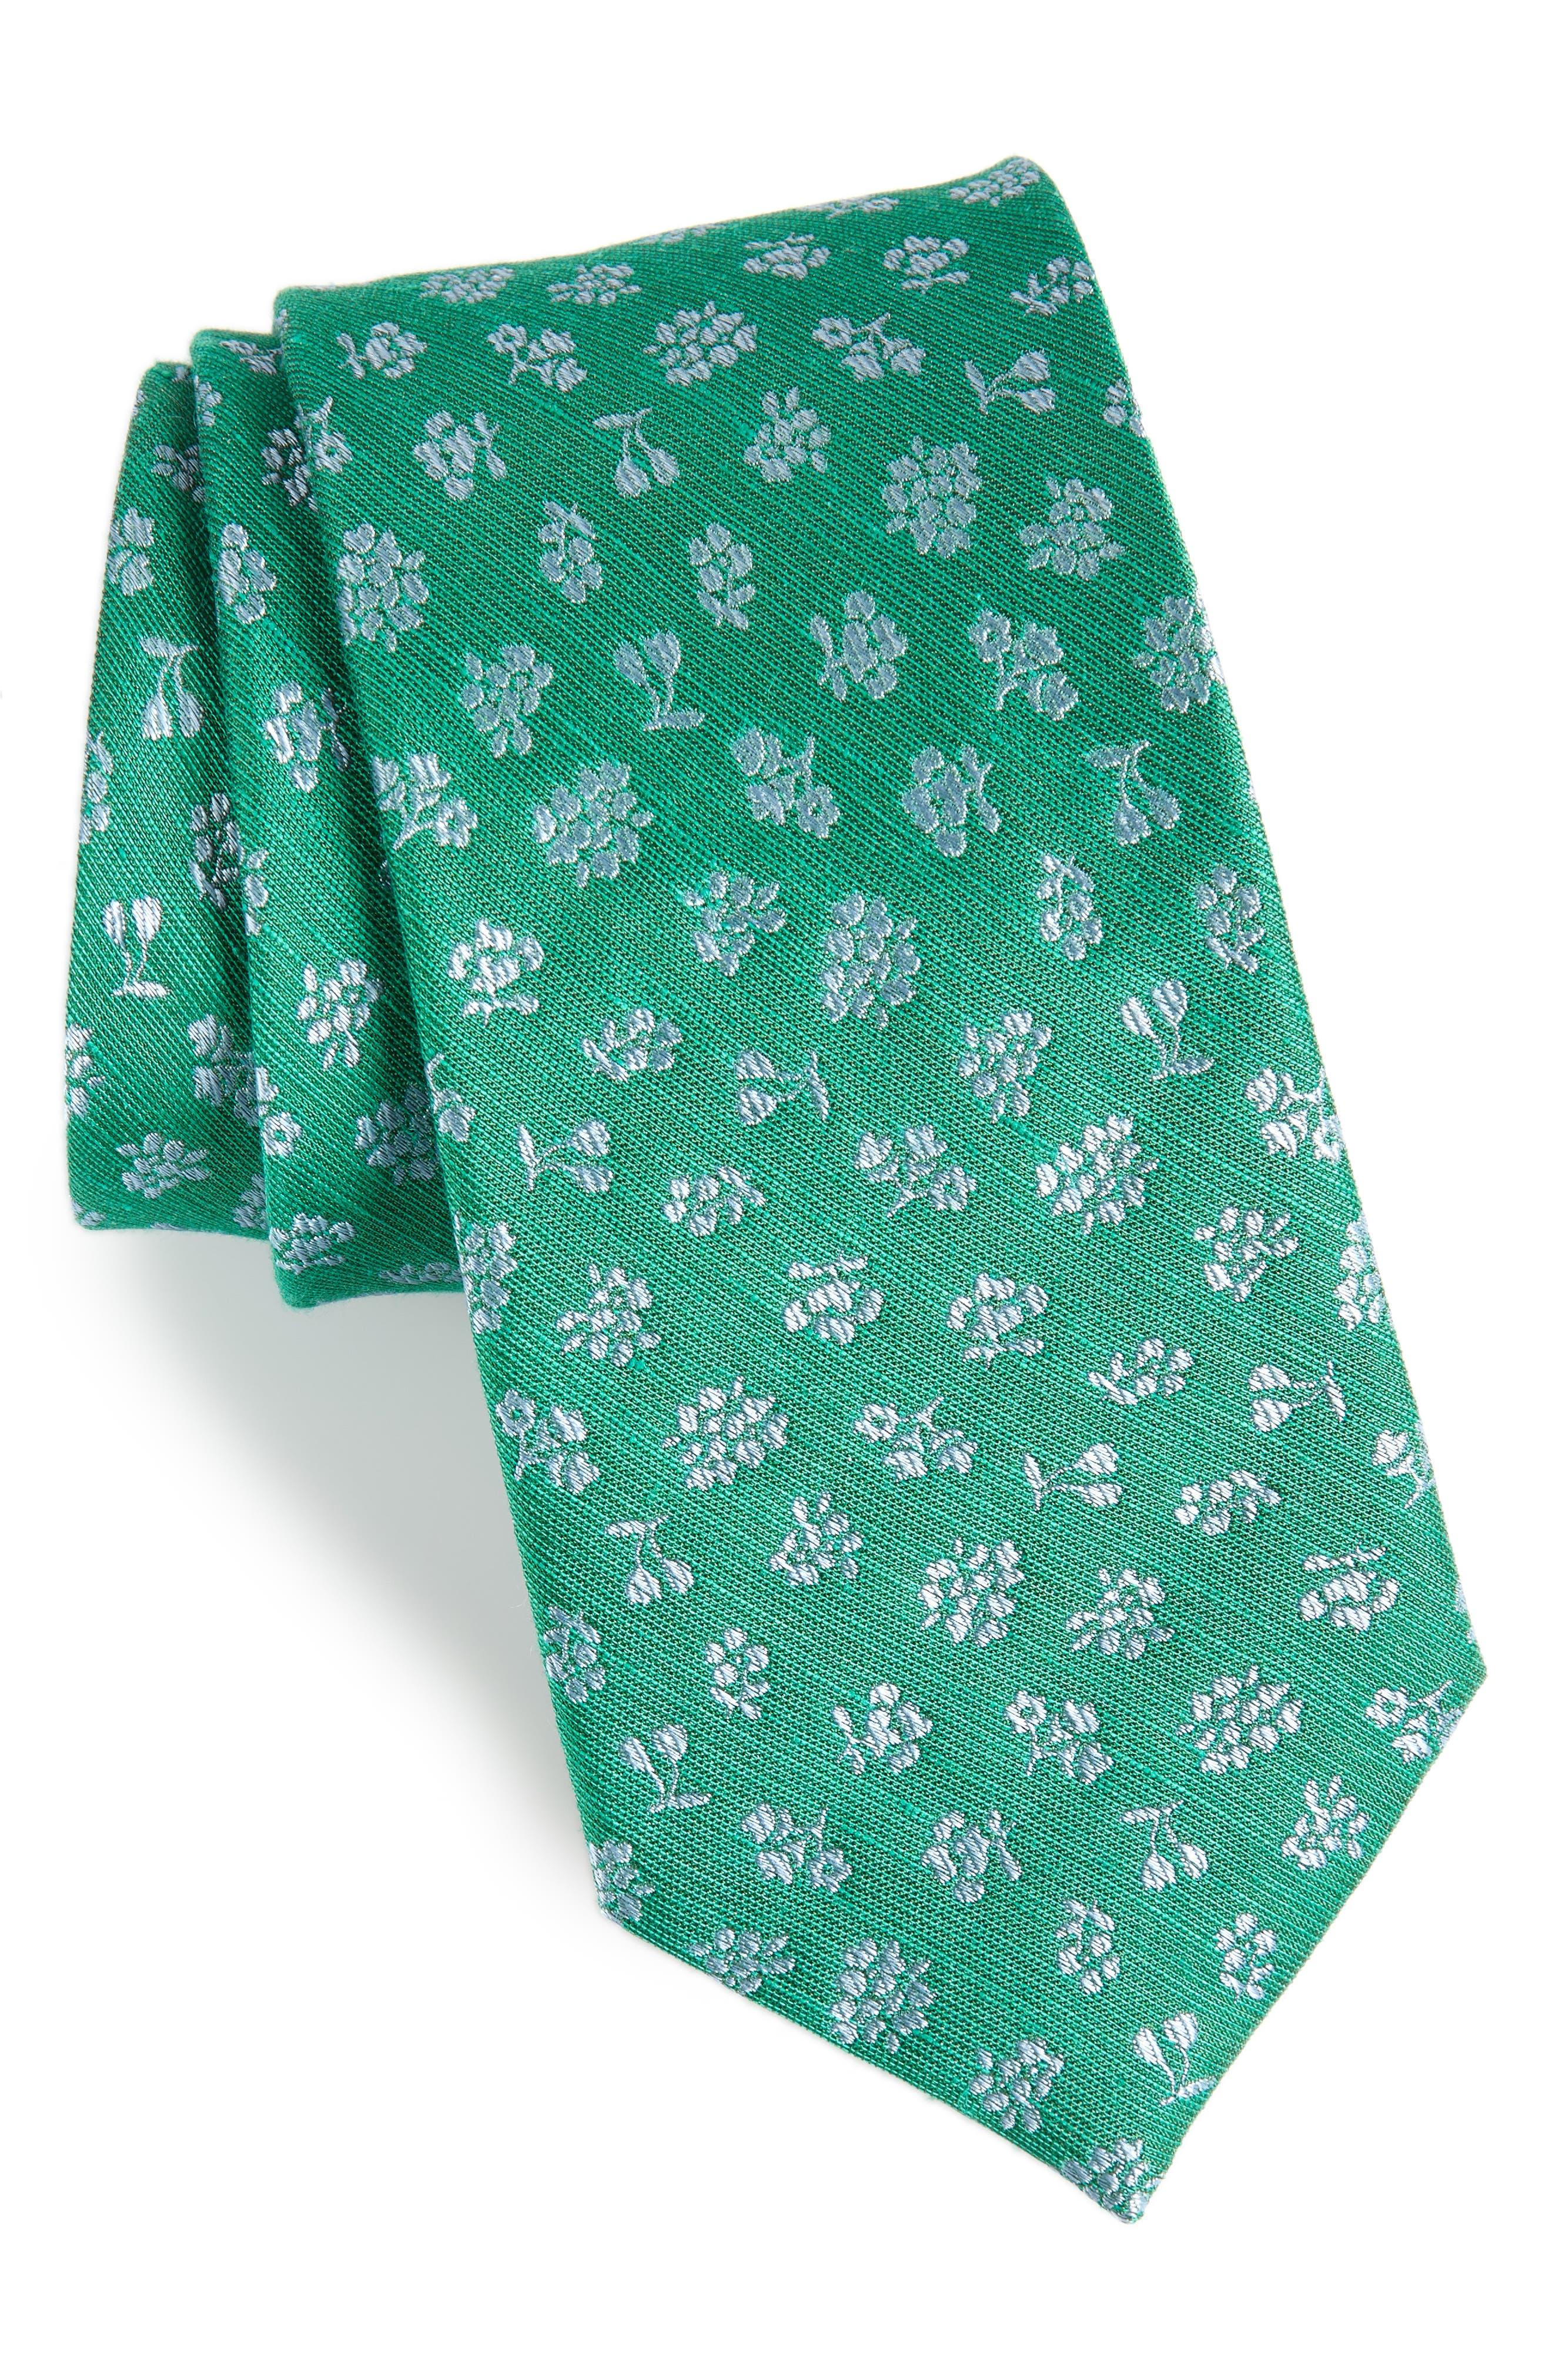 Fruta Floral Silk & Linen Tie,                             Main thumbnail 1, color,                             GREEN